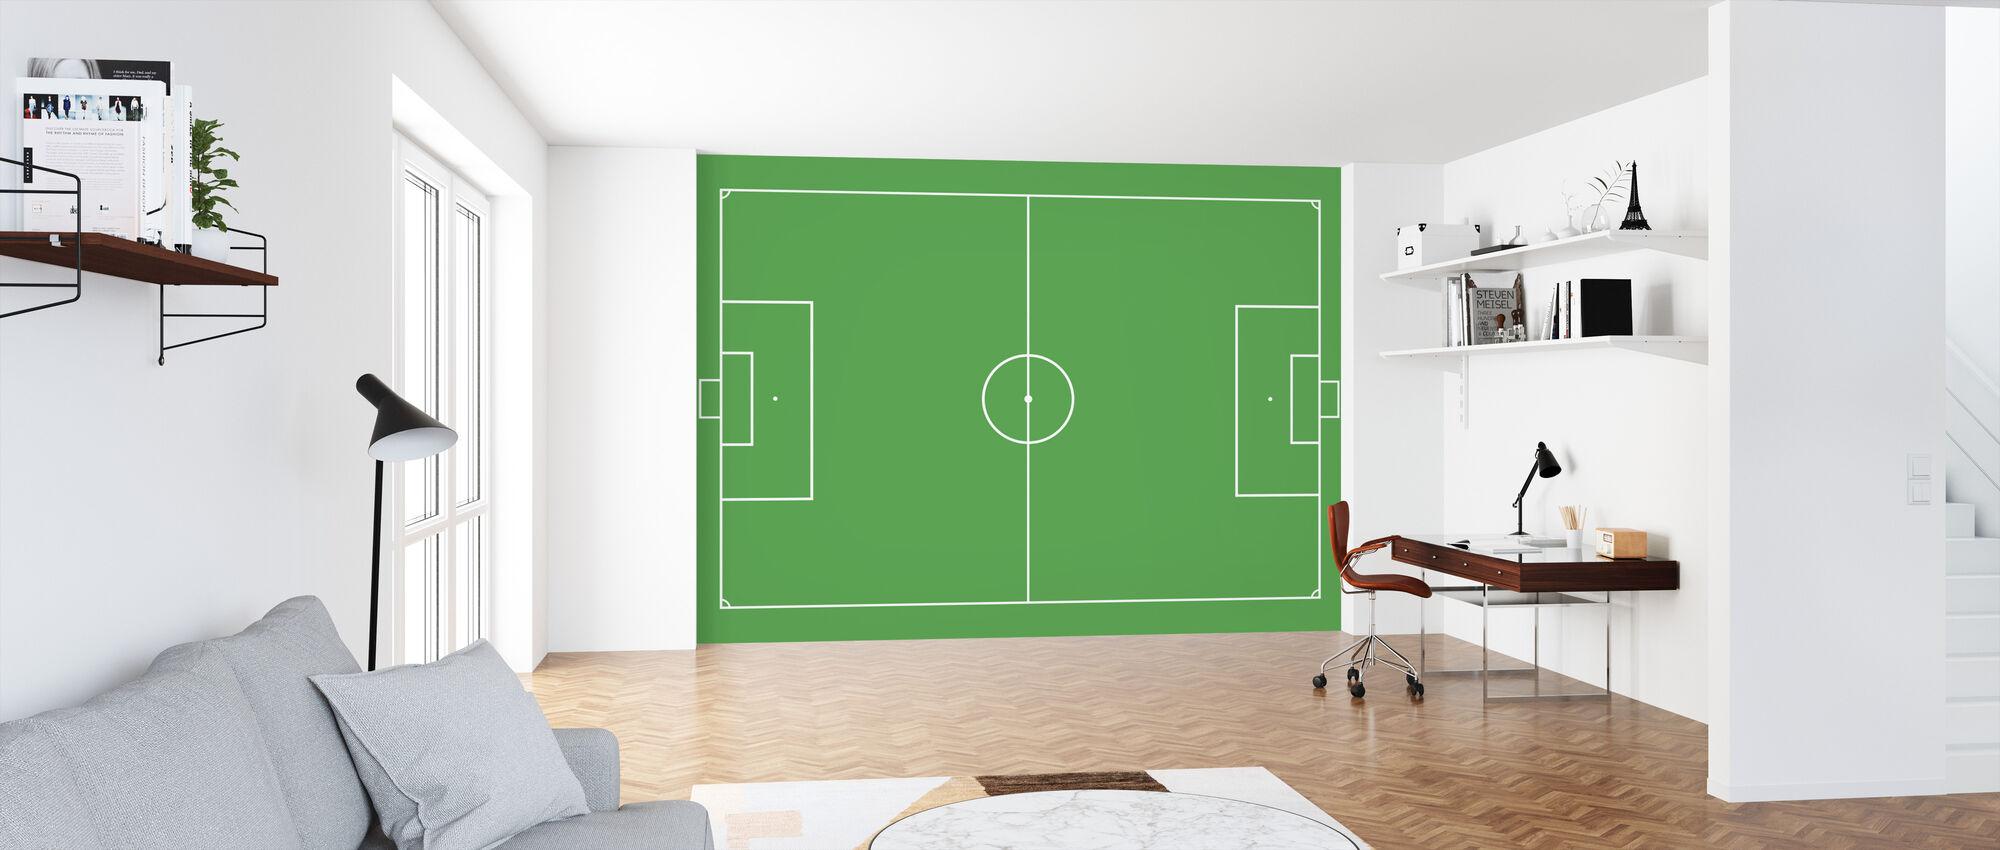 Fußballplatz - Tapete - Büro